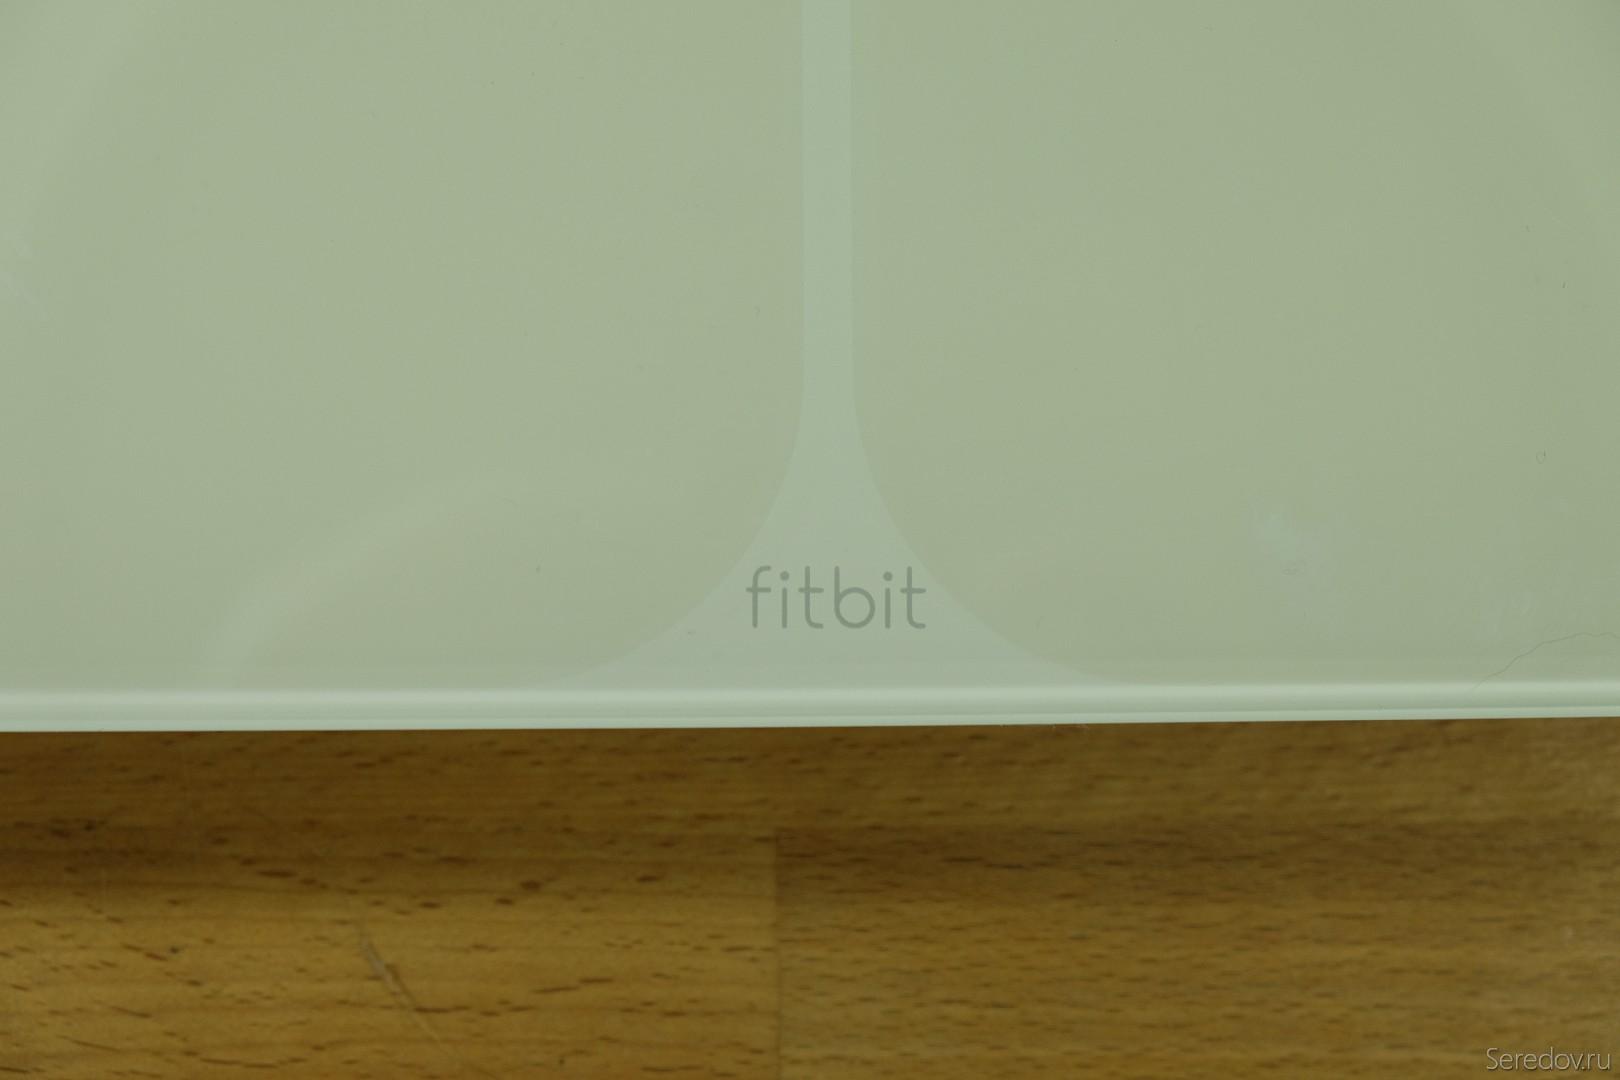 Обзор весов fitbi aria